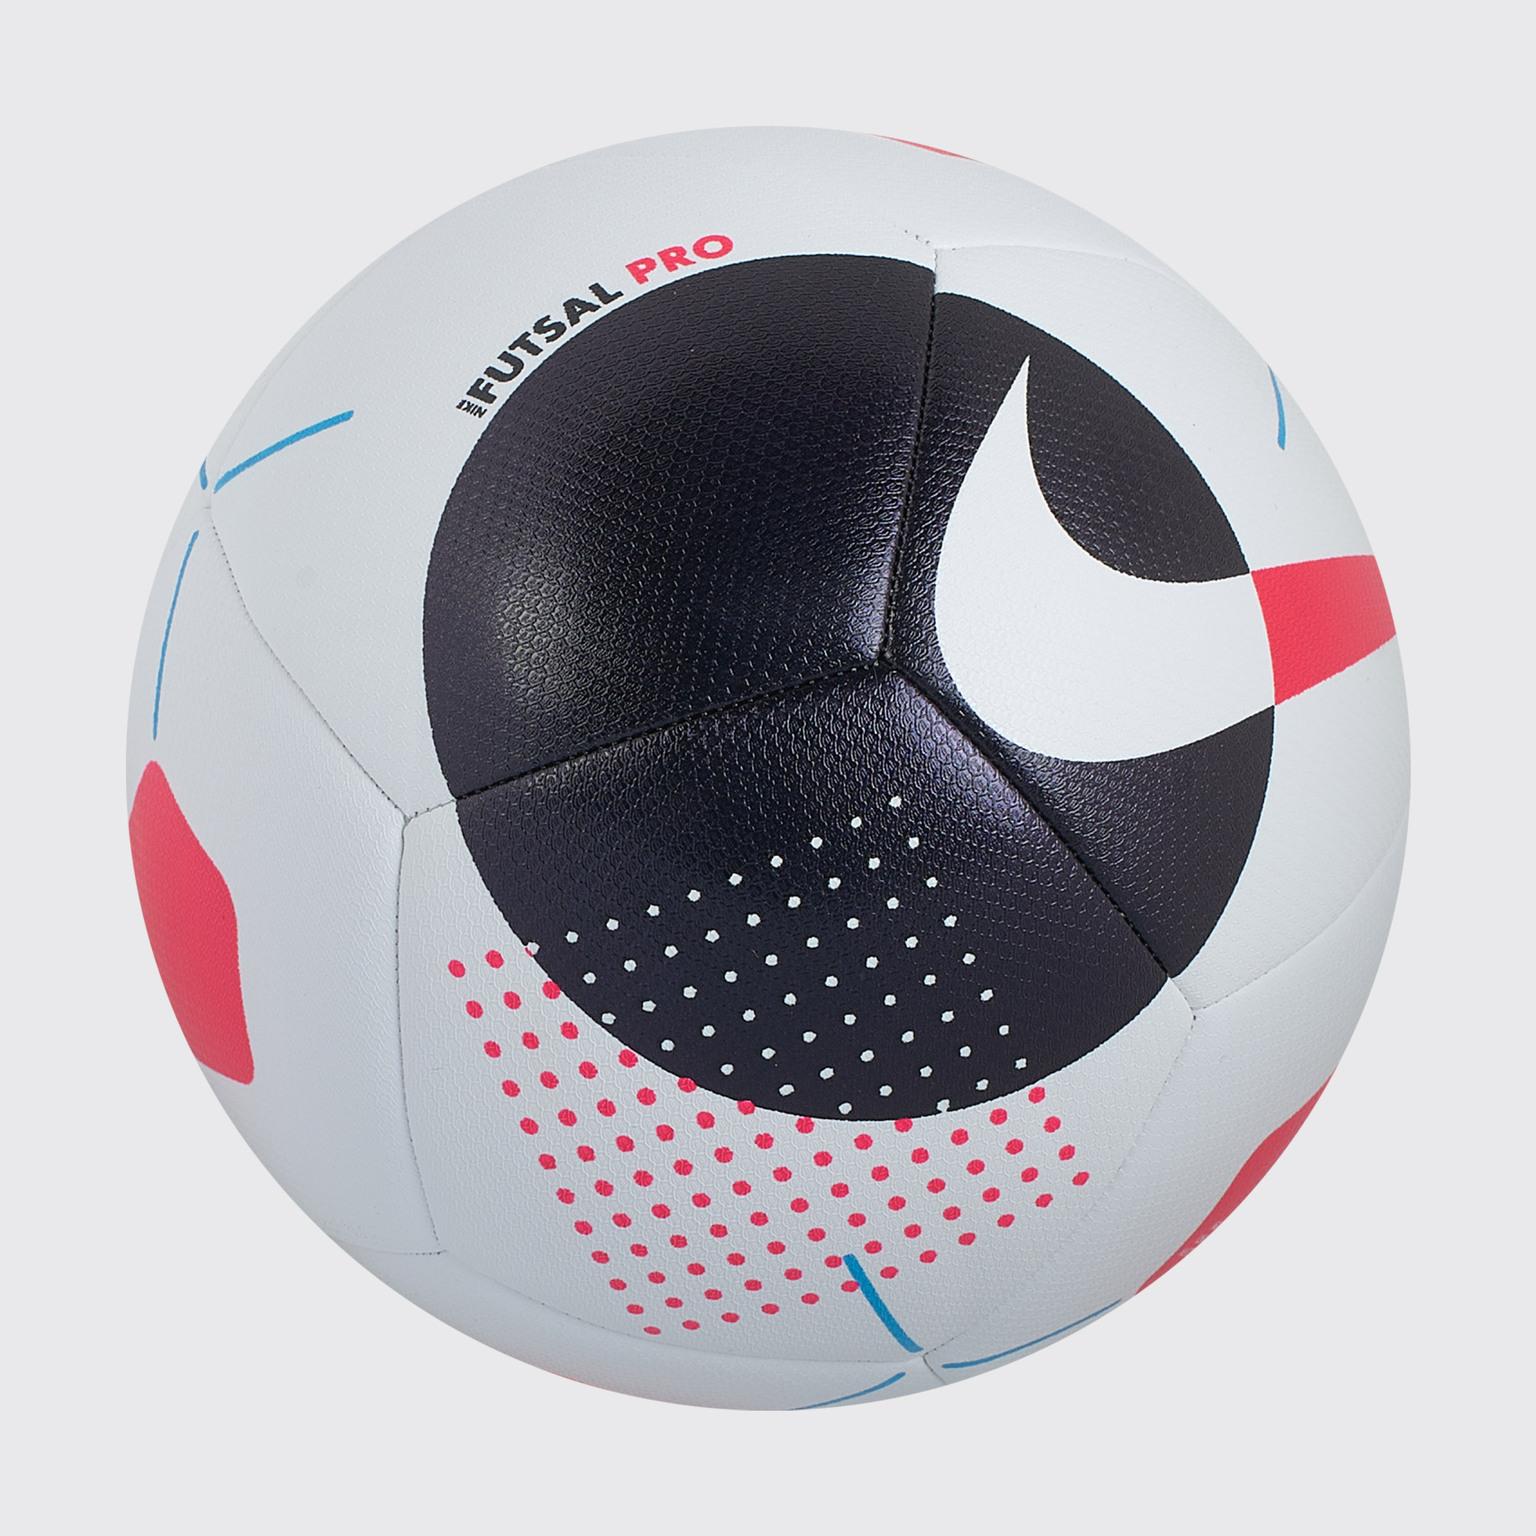 Футзальный мяч Nike Futsal Pro SC3971-102